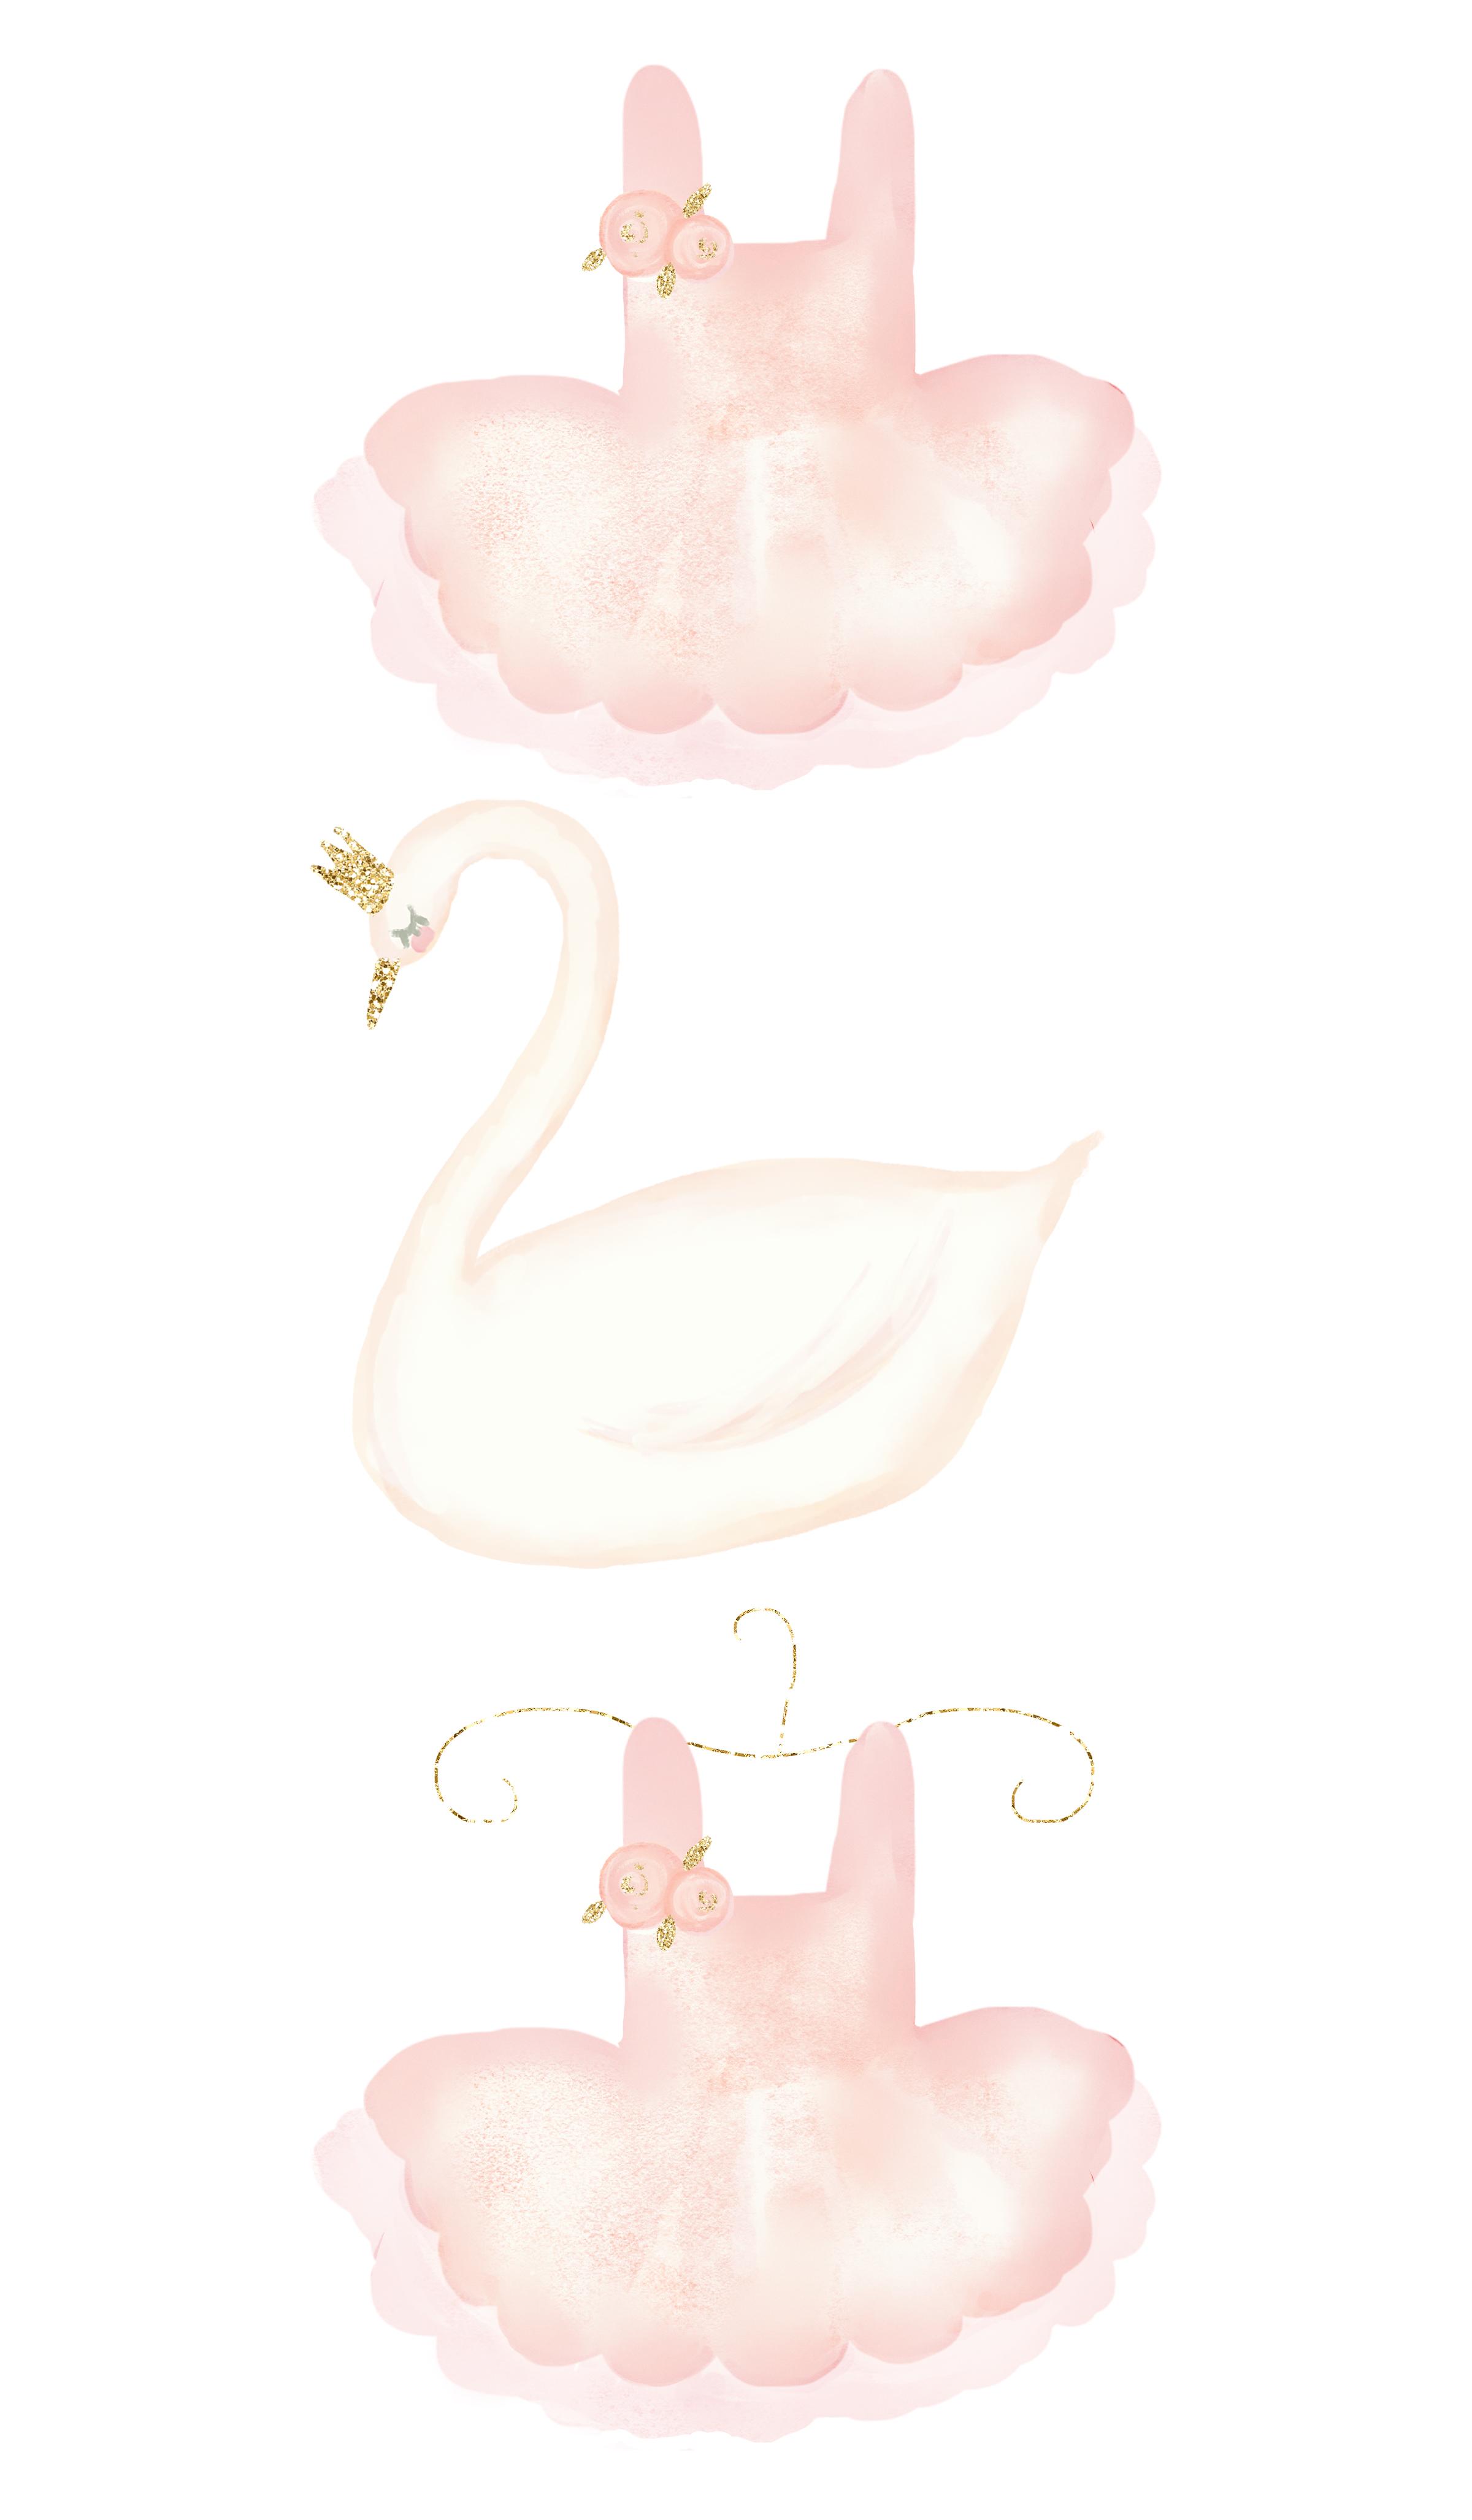 Swan Princess Watercolor Clipart example image 3